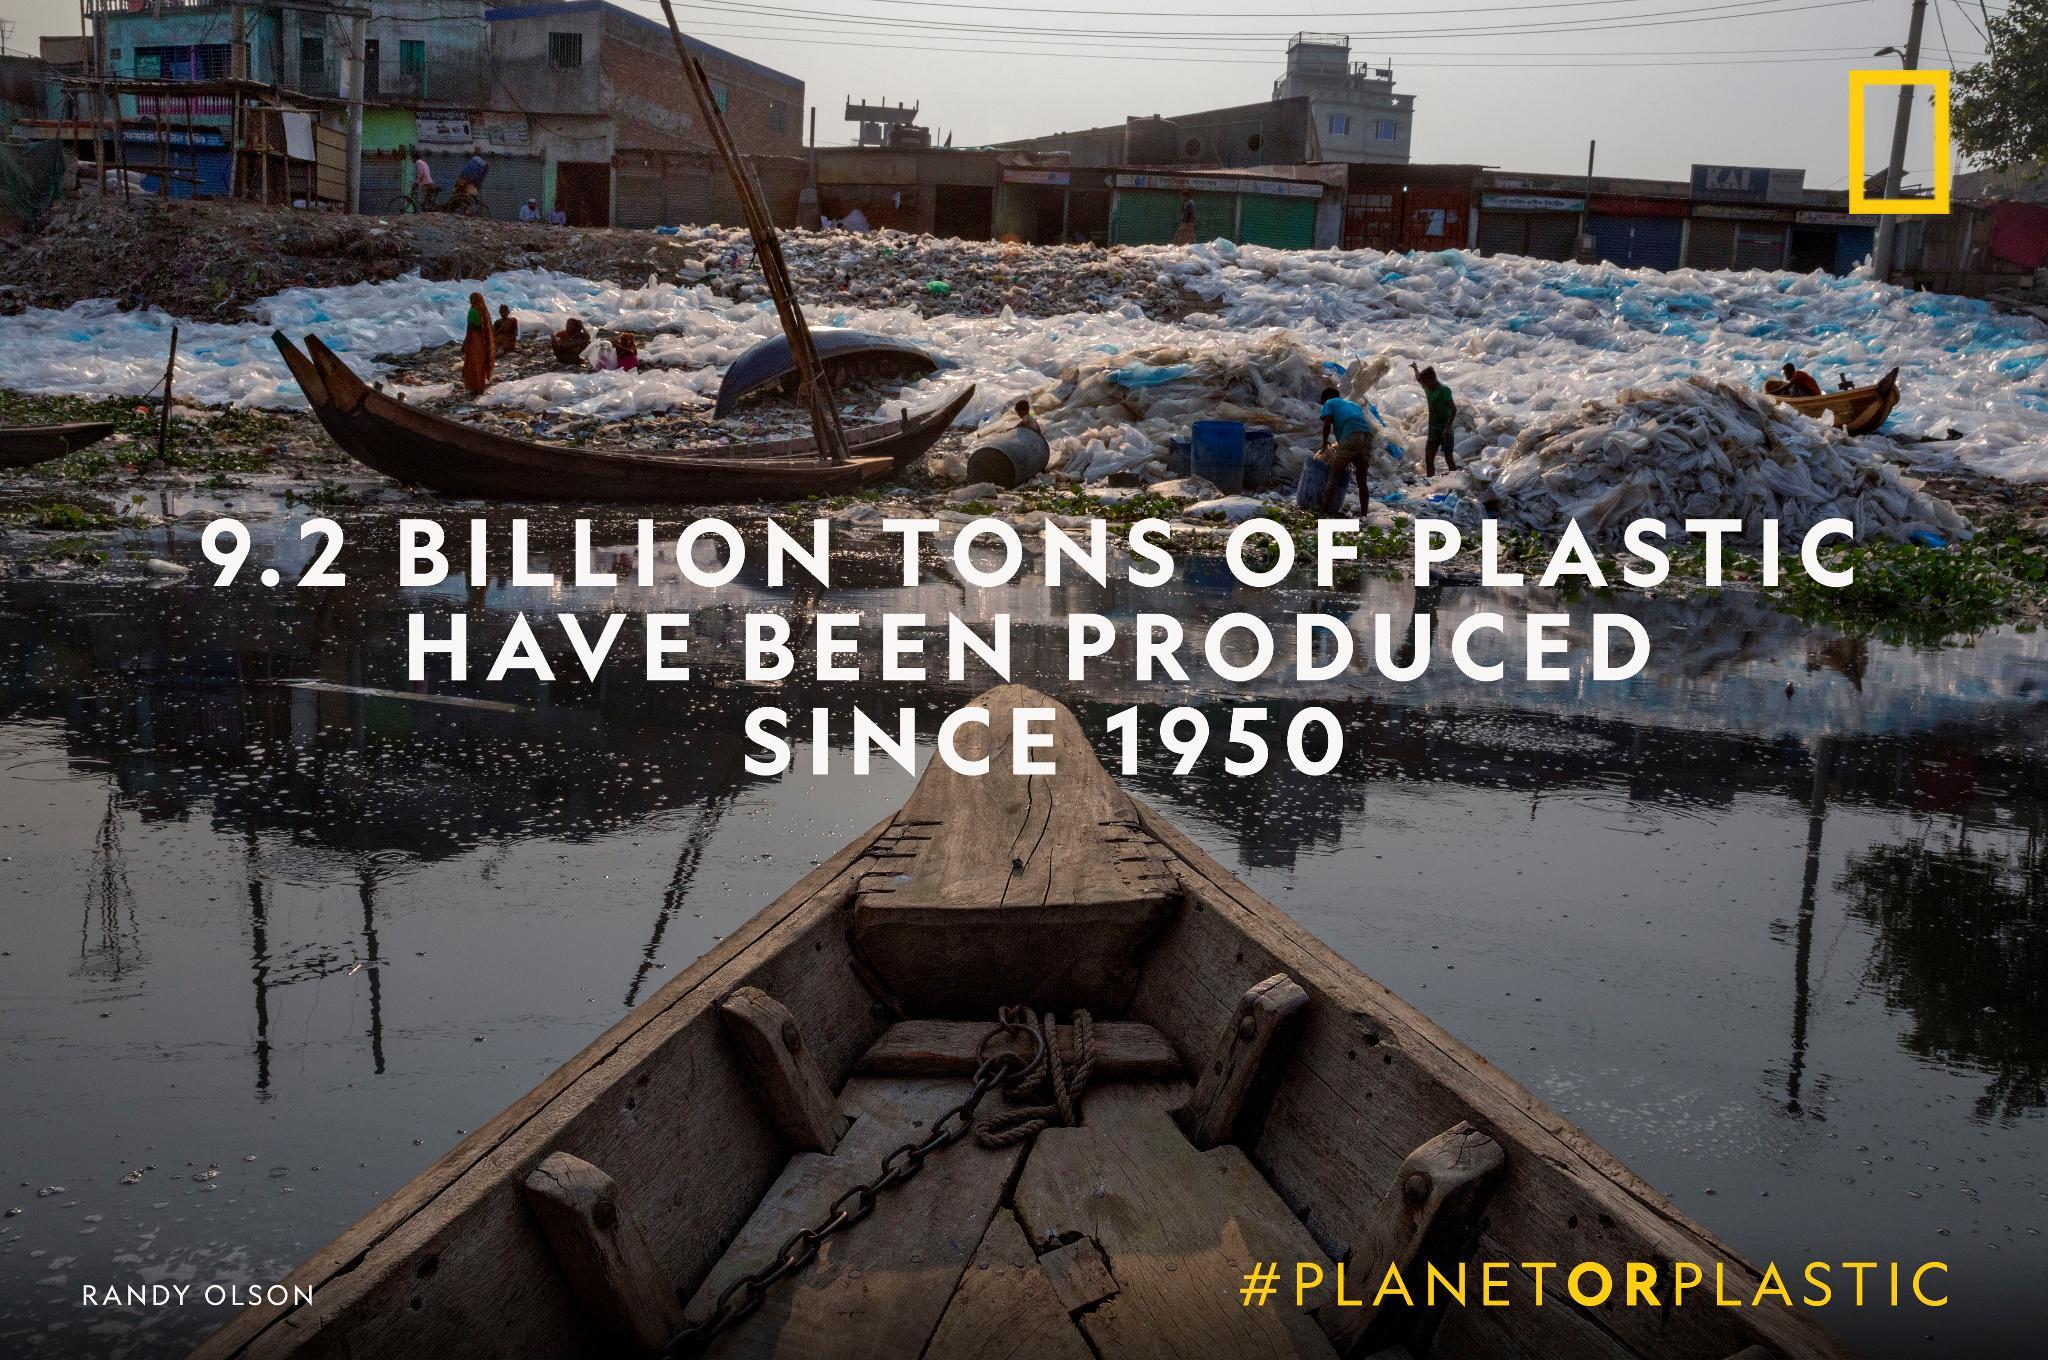 Will you choose #PlanetOrPlastic? Take your pledge today. https://t.co/bRpFlx6weq https://t.co/8bK6D2JyS5